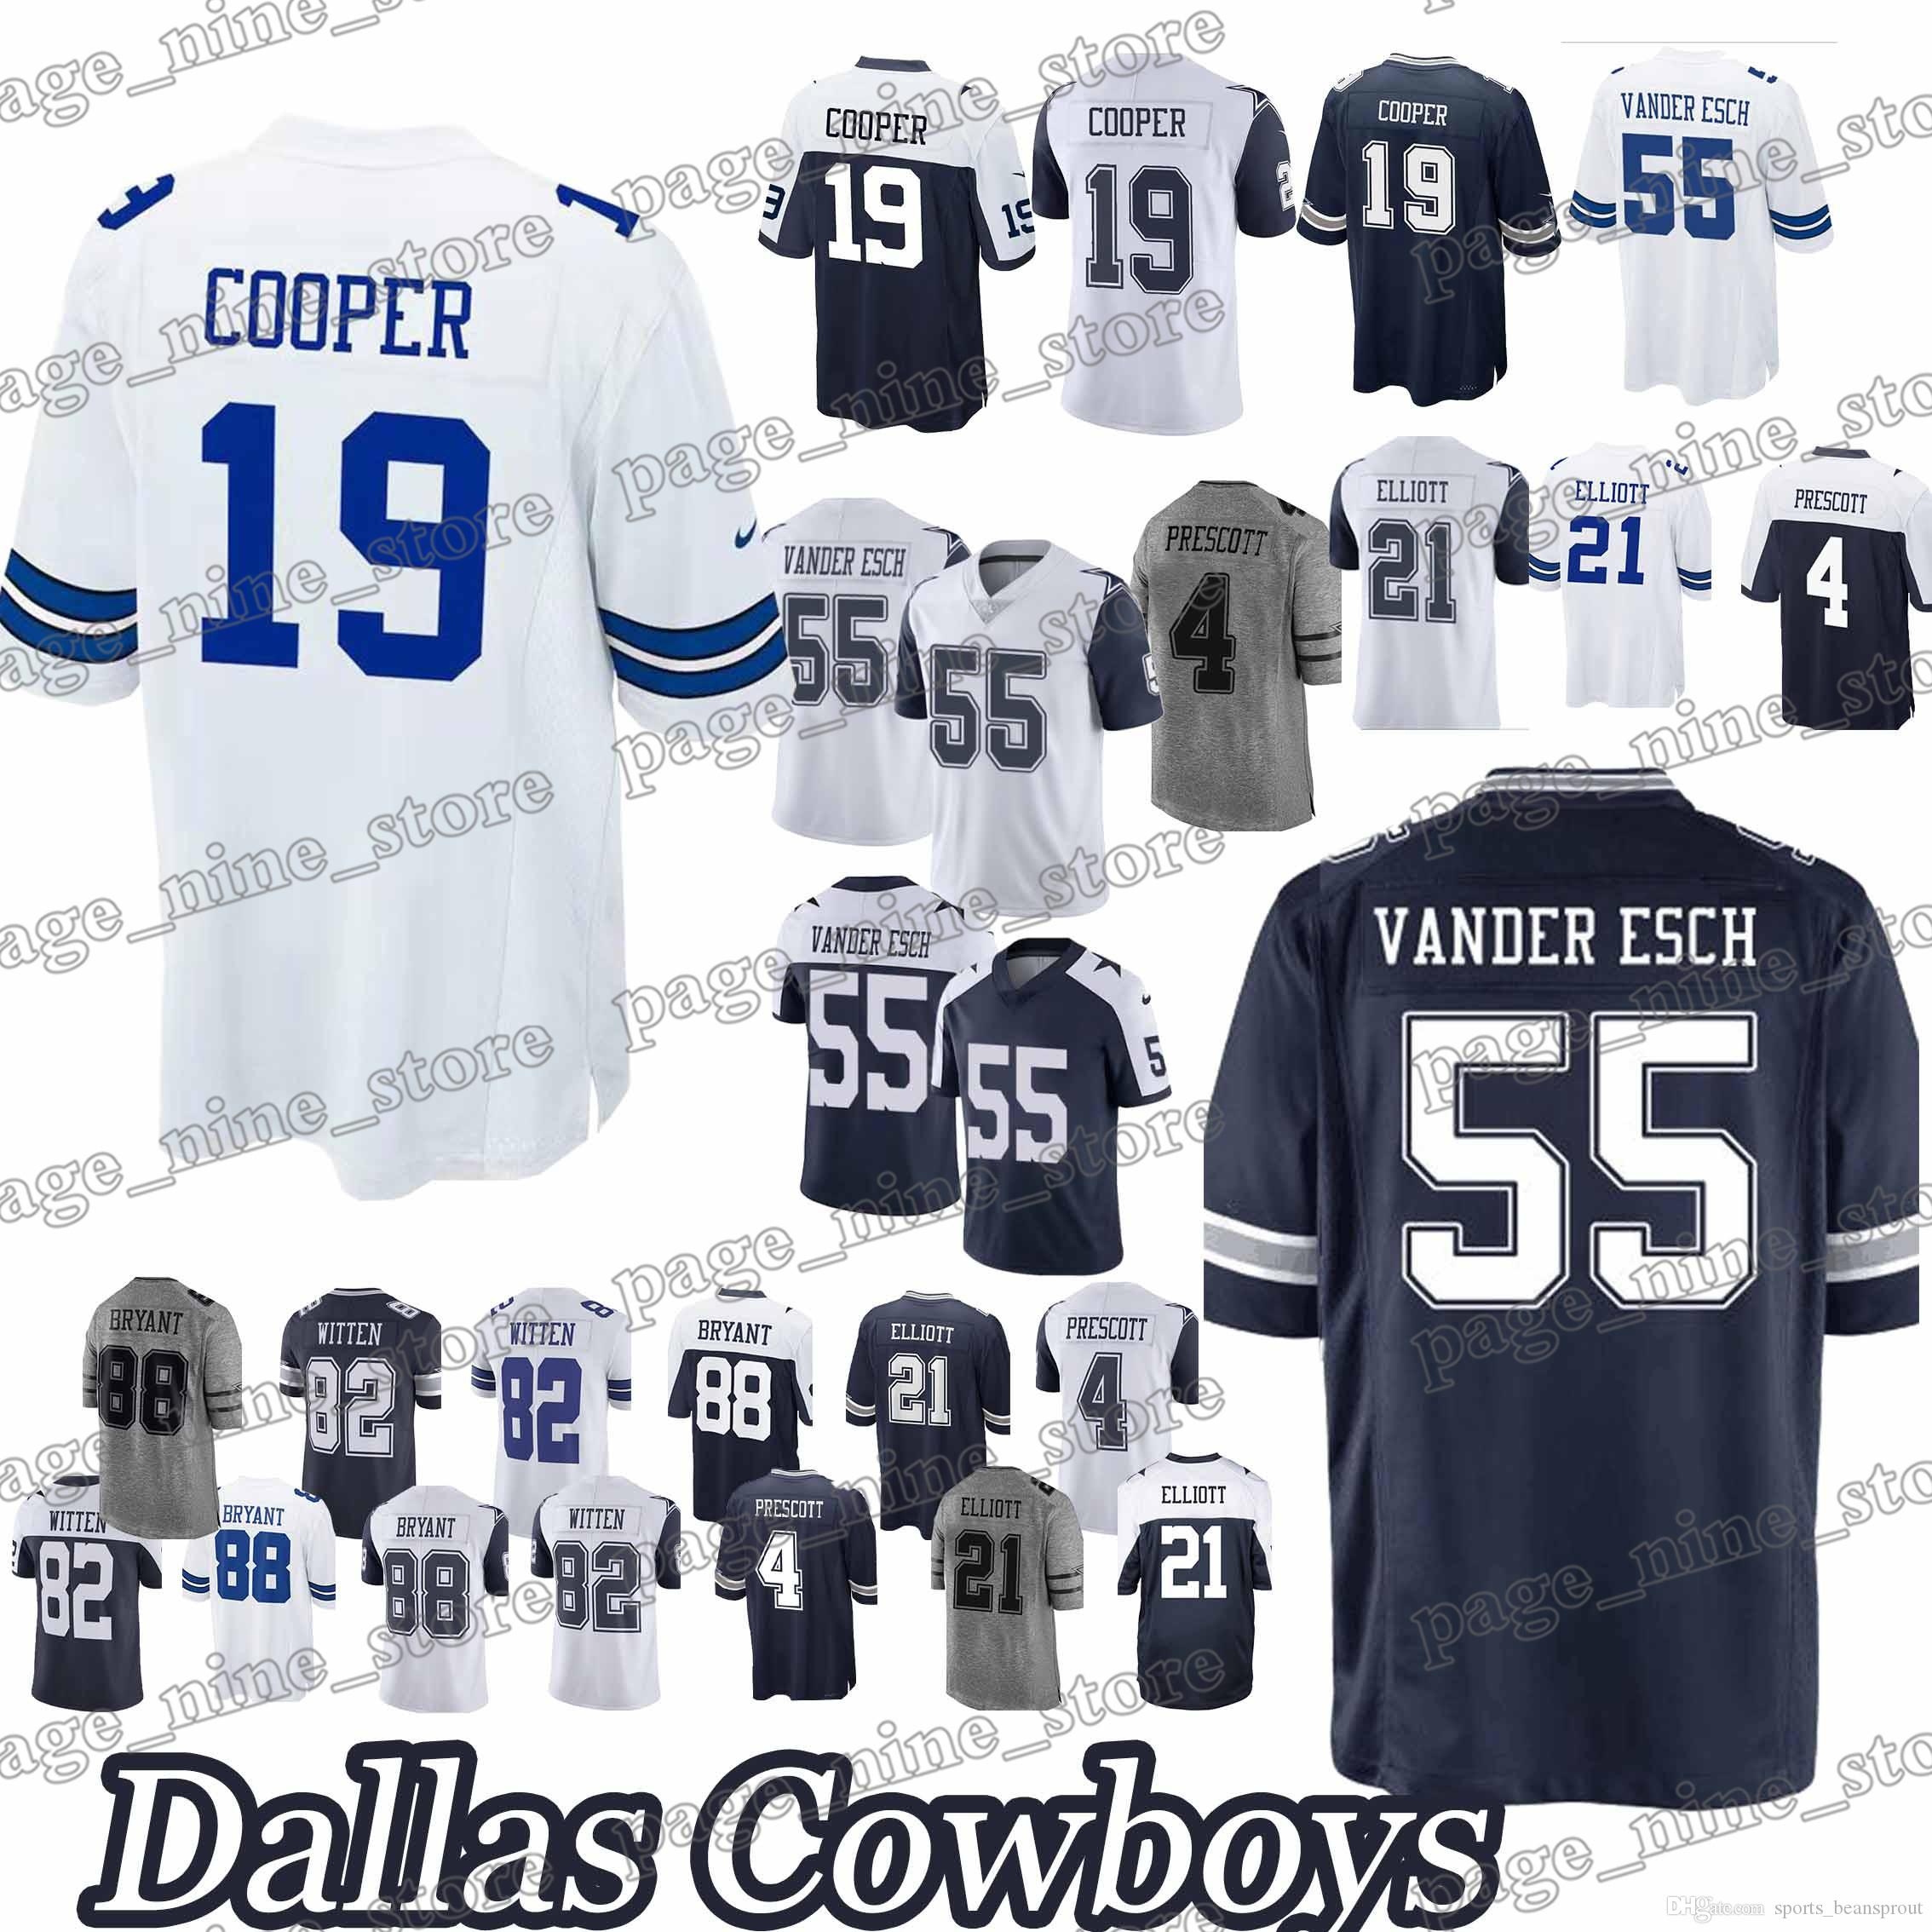 27c8cafdaea Dallas Cowboys Jerseys 19 Amari Cooper 55 Leighton Vander Esch 88 ...